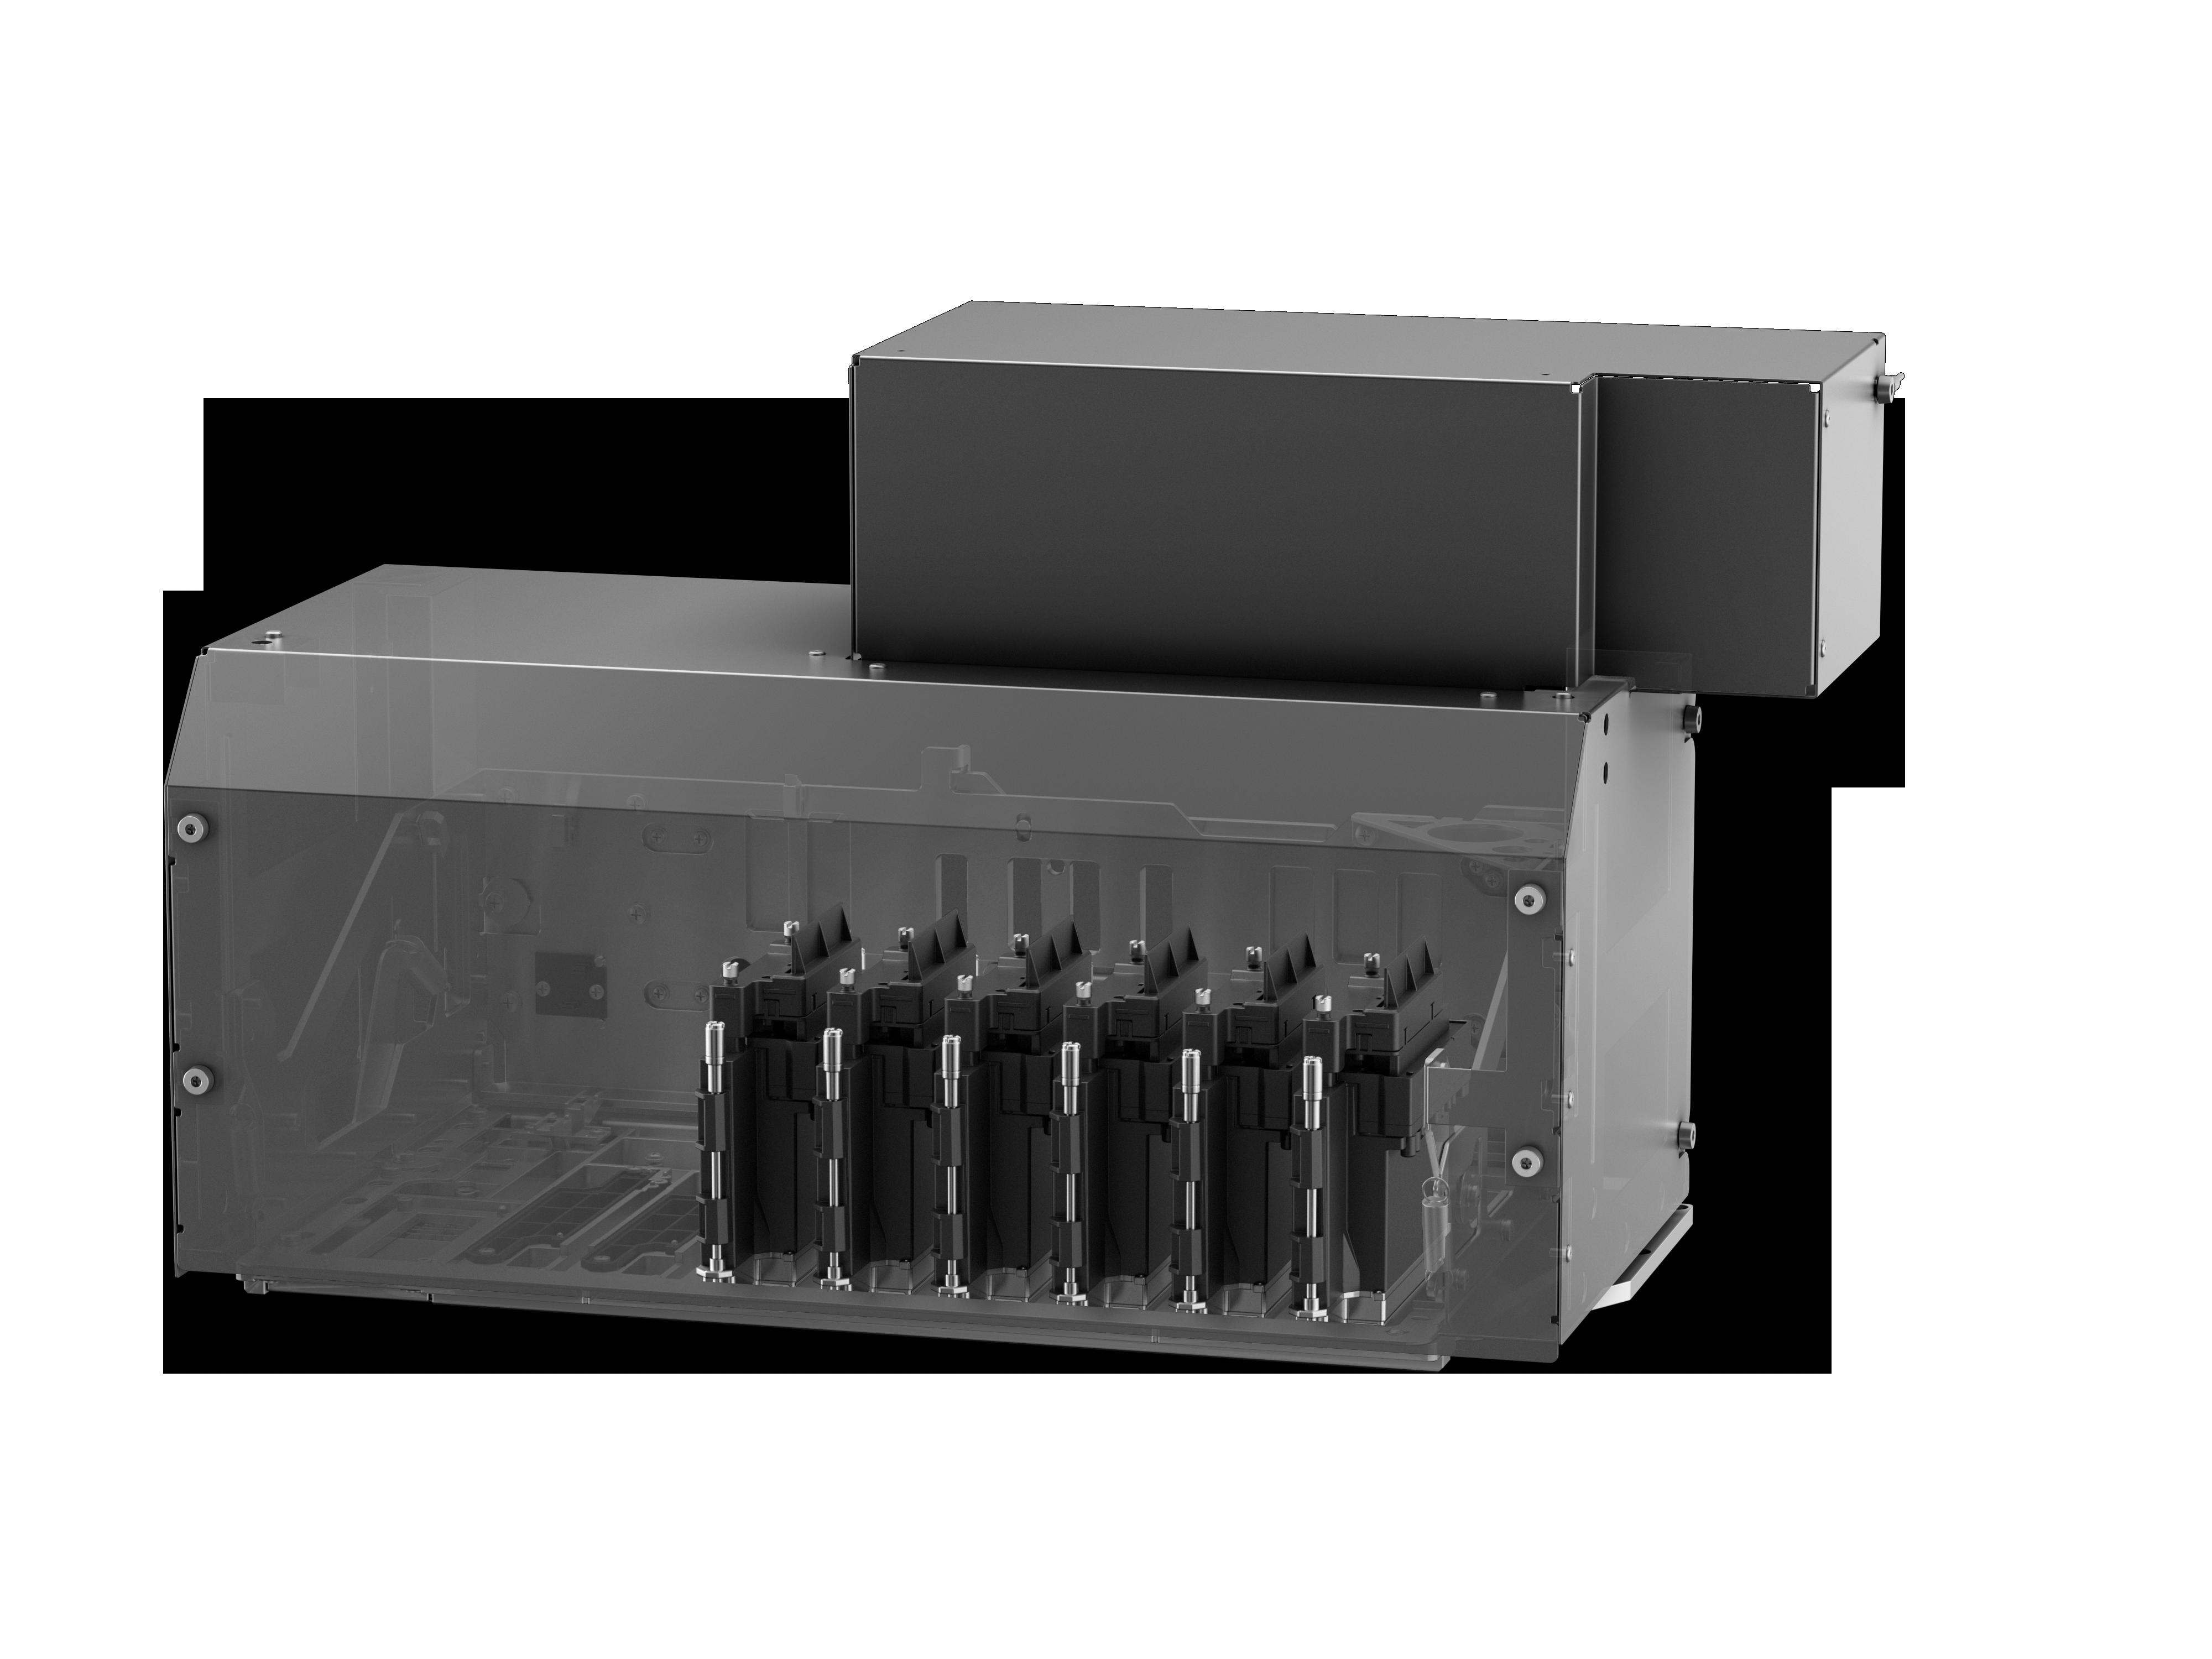 Epson SureColor F10070H printheads